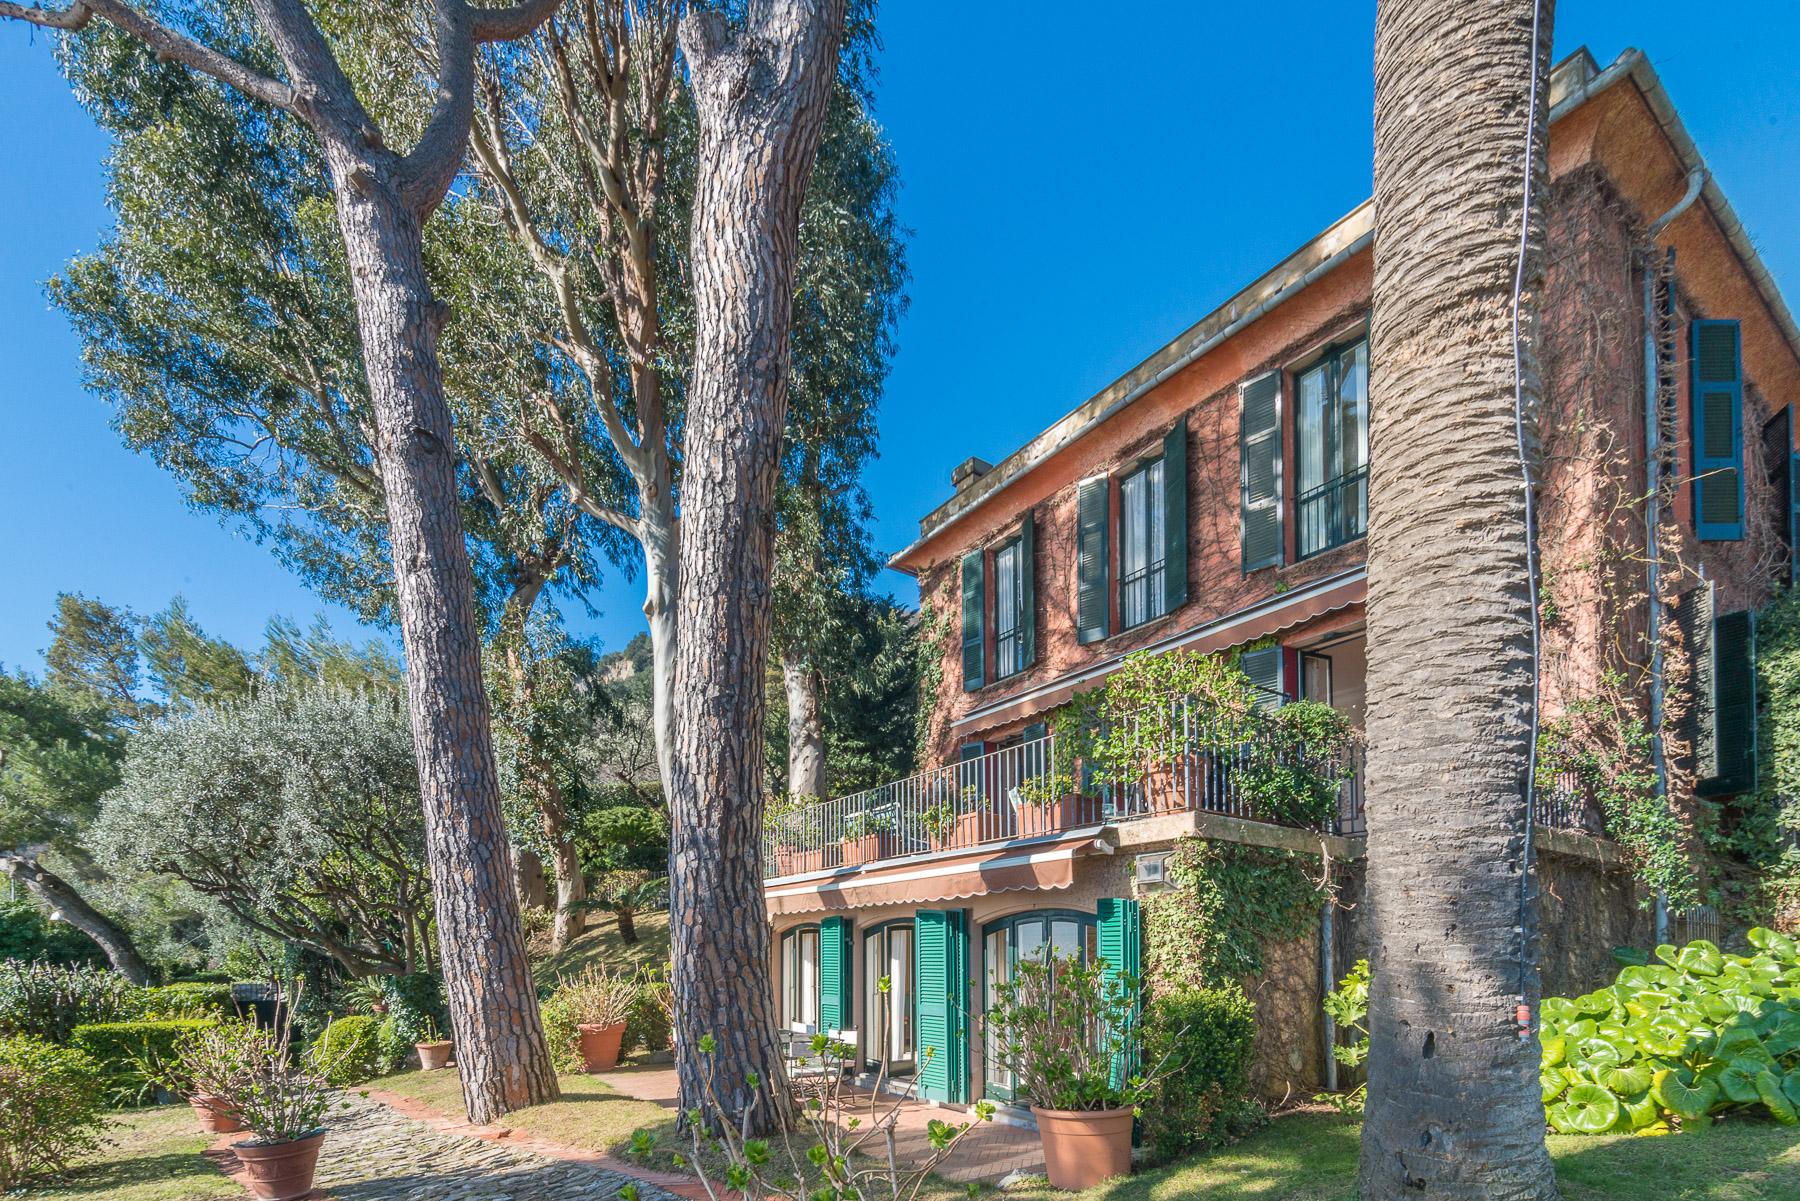 Villa in Vendita a Santa Margherita Ligure: 5 locali, 440 mq - Foto 6